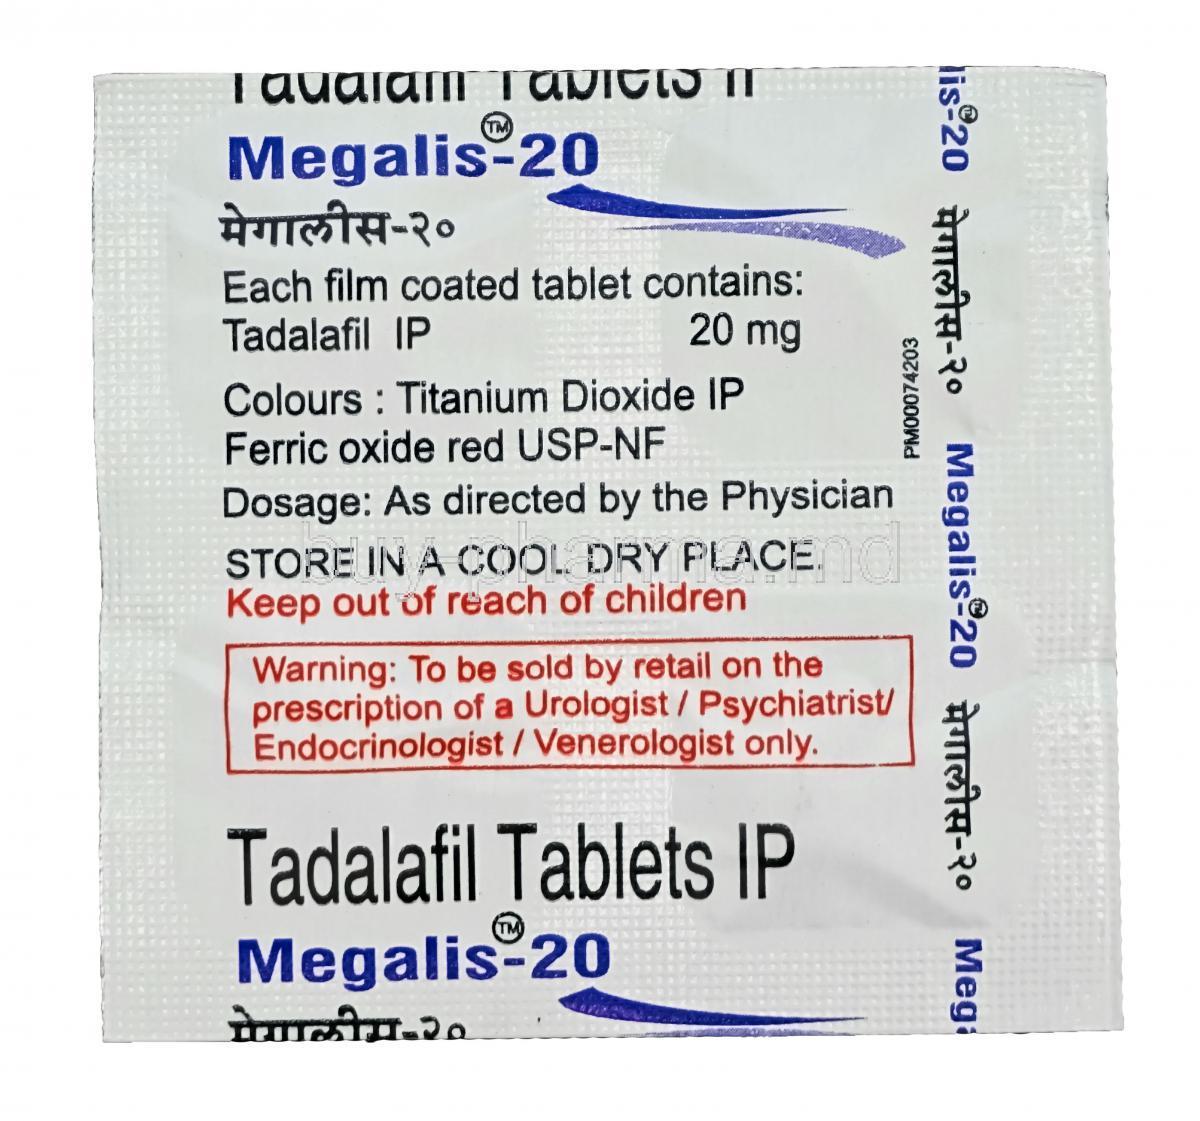 Tadalafil tablets ip megalis 20 dosages for cialis